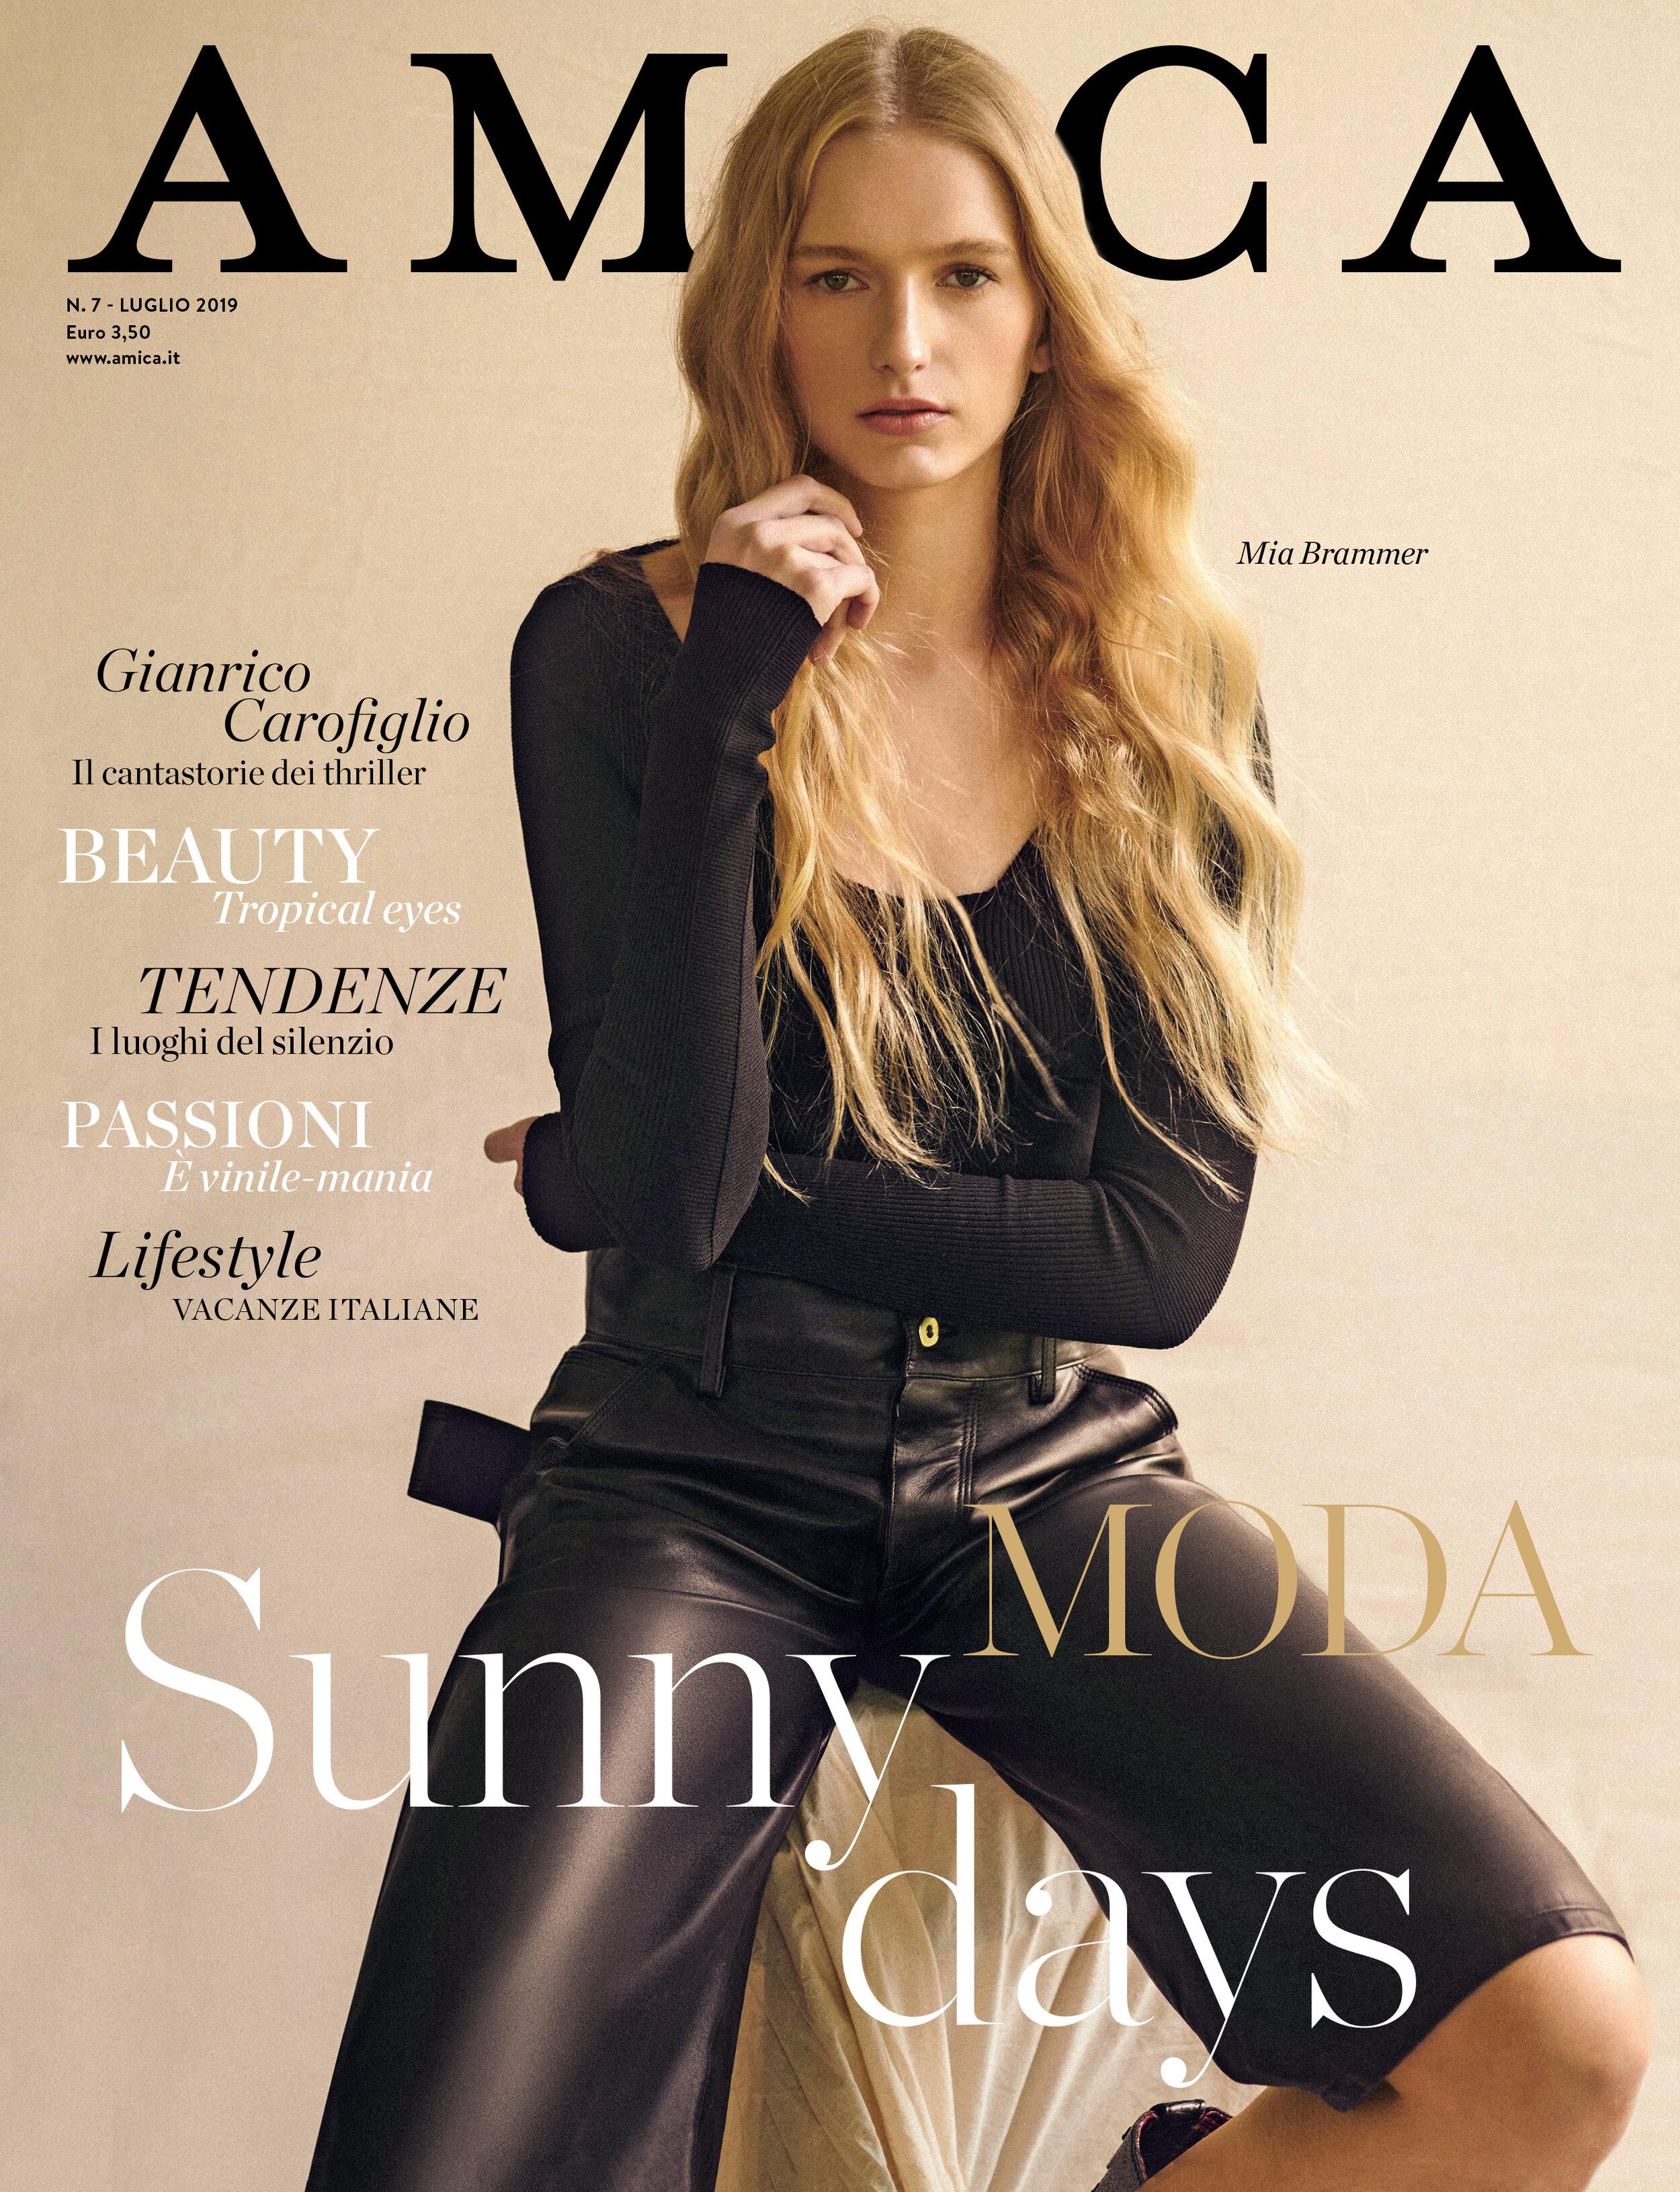 07 Amica Cover.jpg